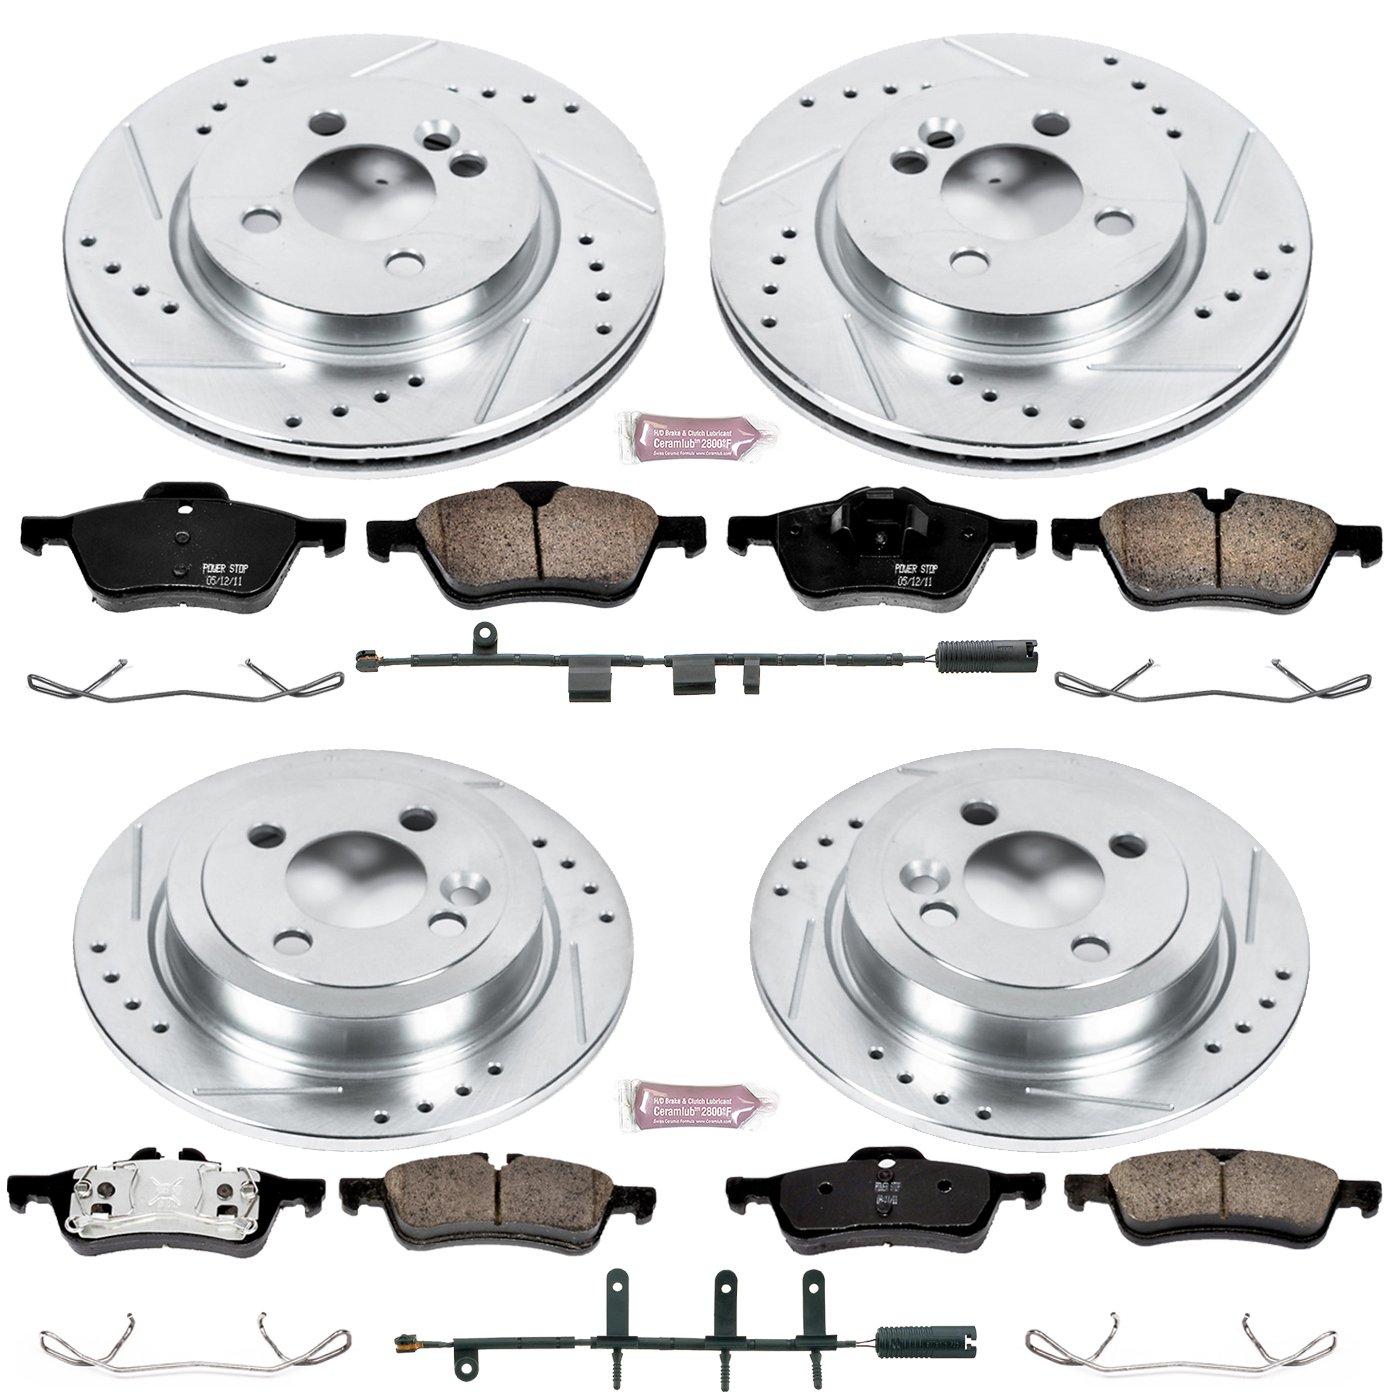 Power Stop K1381 Front /& Rear Brake Kit with Drilled//Slotted Brake Rotors and Z23 Evolution Ceramic Brake Pads